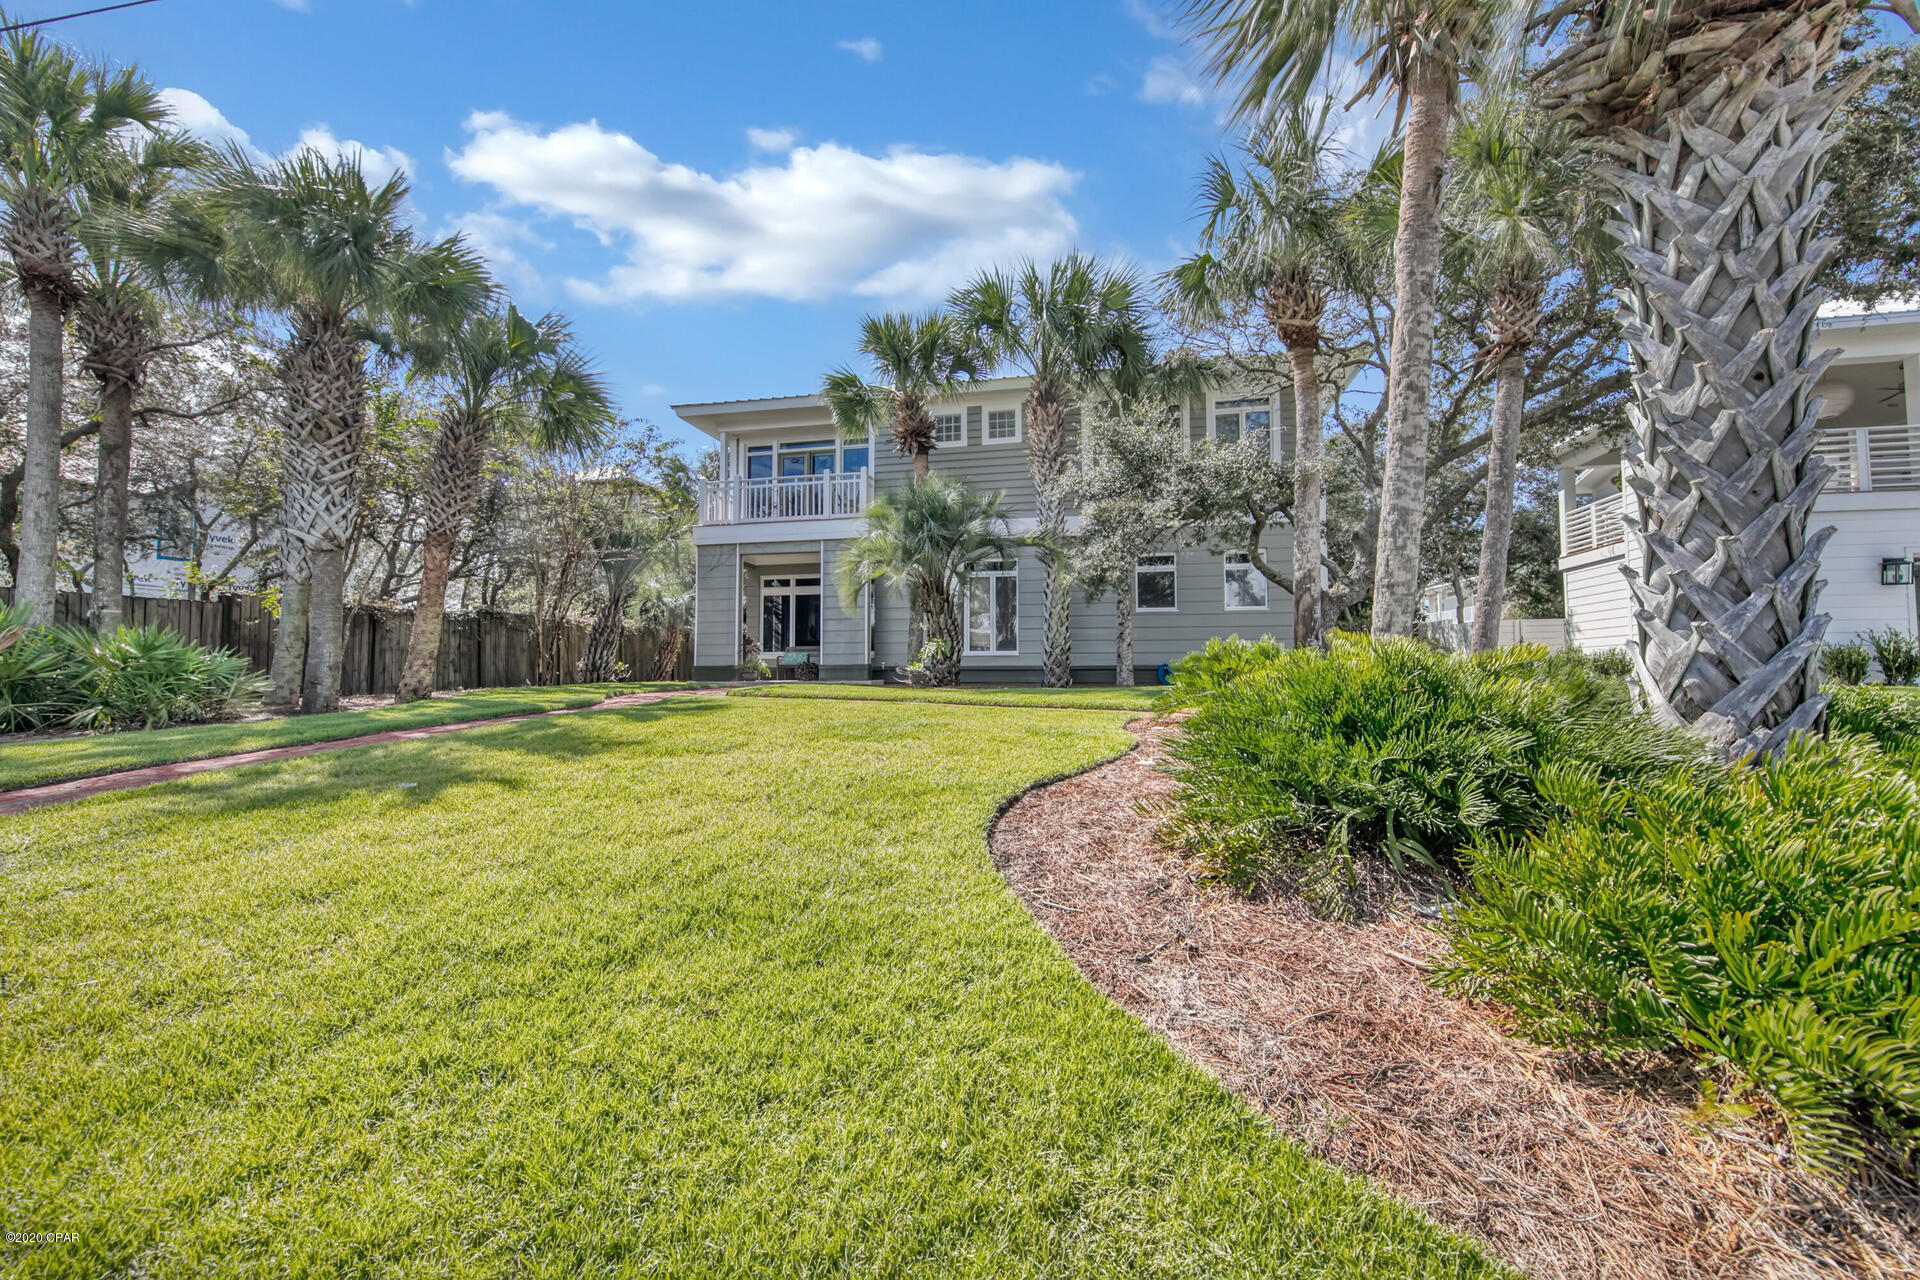 Photo of 45 Seacrest Drive, Inlet Beach, FL 32461